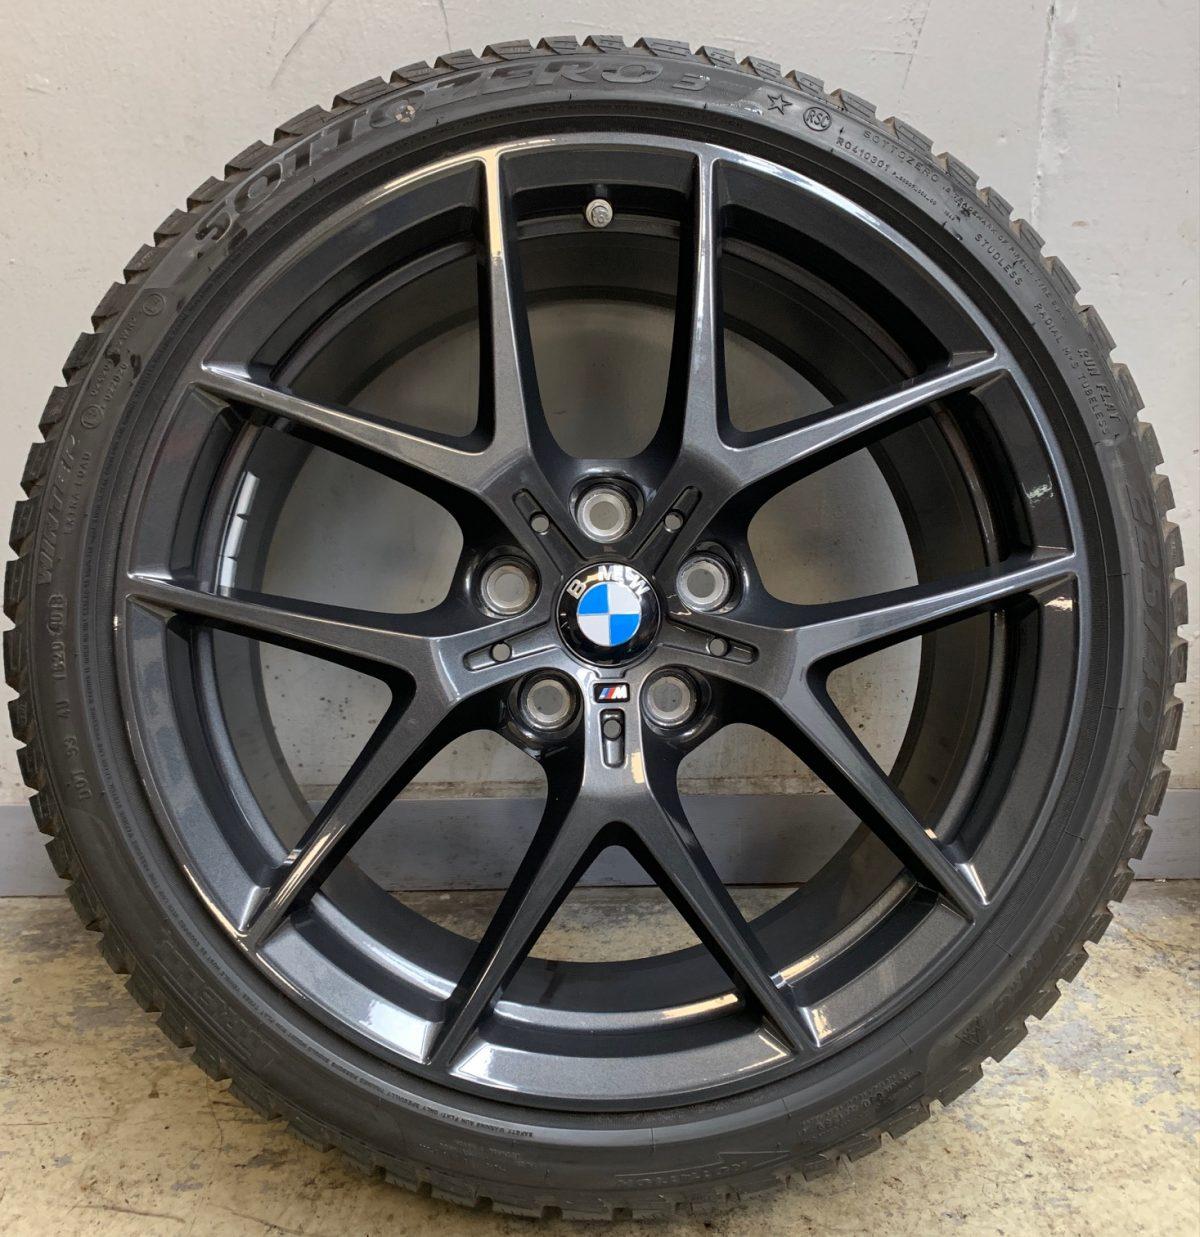 BMW új 1-es F40 (554M styl) gumikkal 8X18 5x112 új télikerék-garnitúra Bridgestone 1